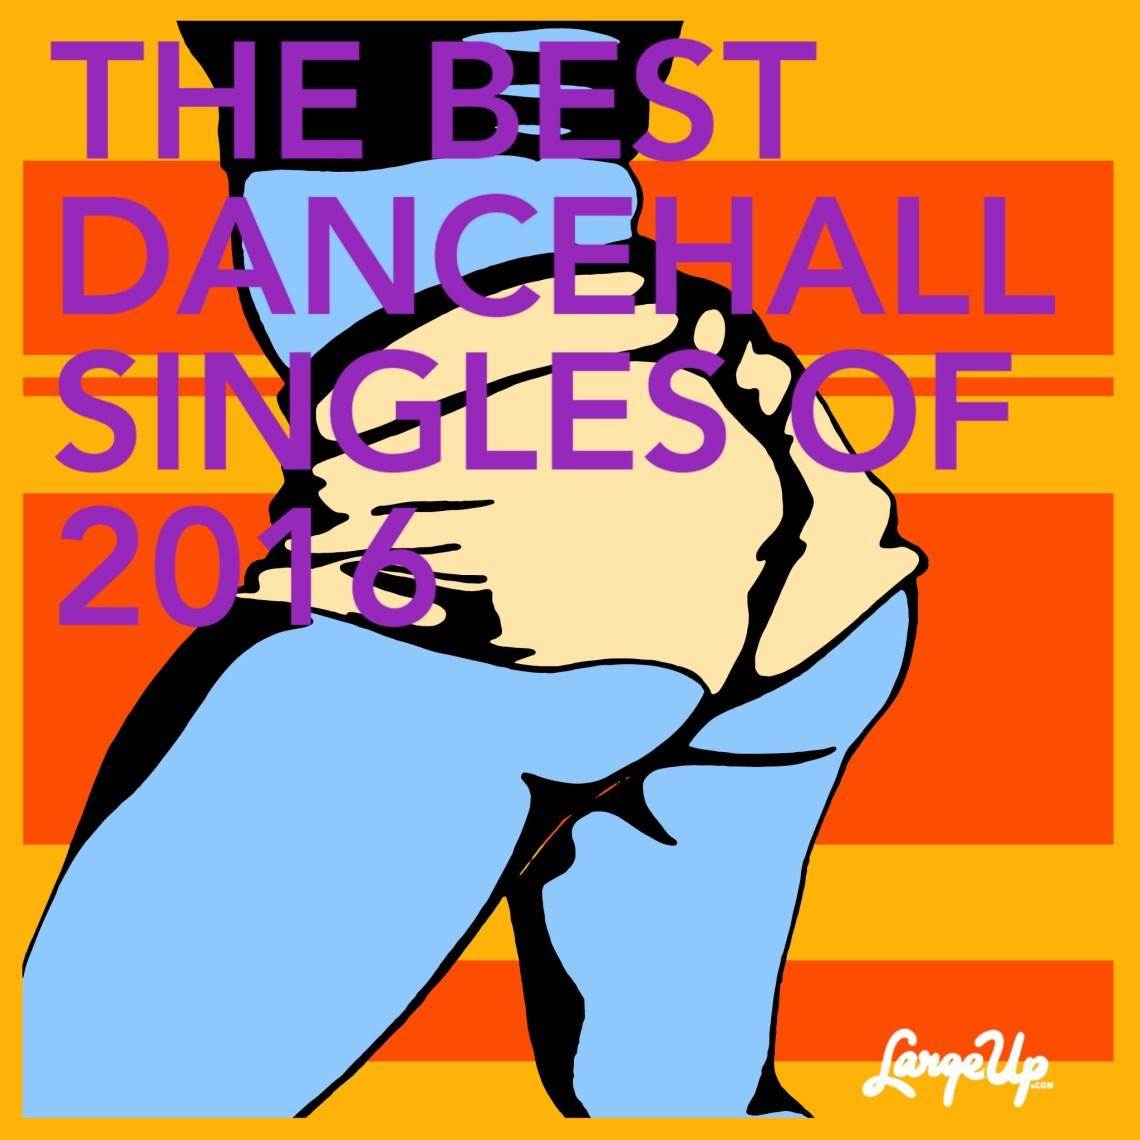 http://www.largeup.com/2016/12/15/best-dancehall-singles-of-2016/2/